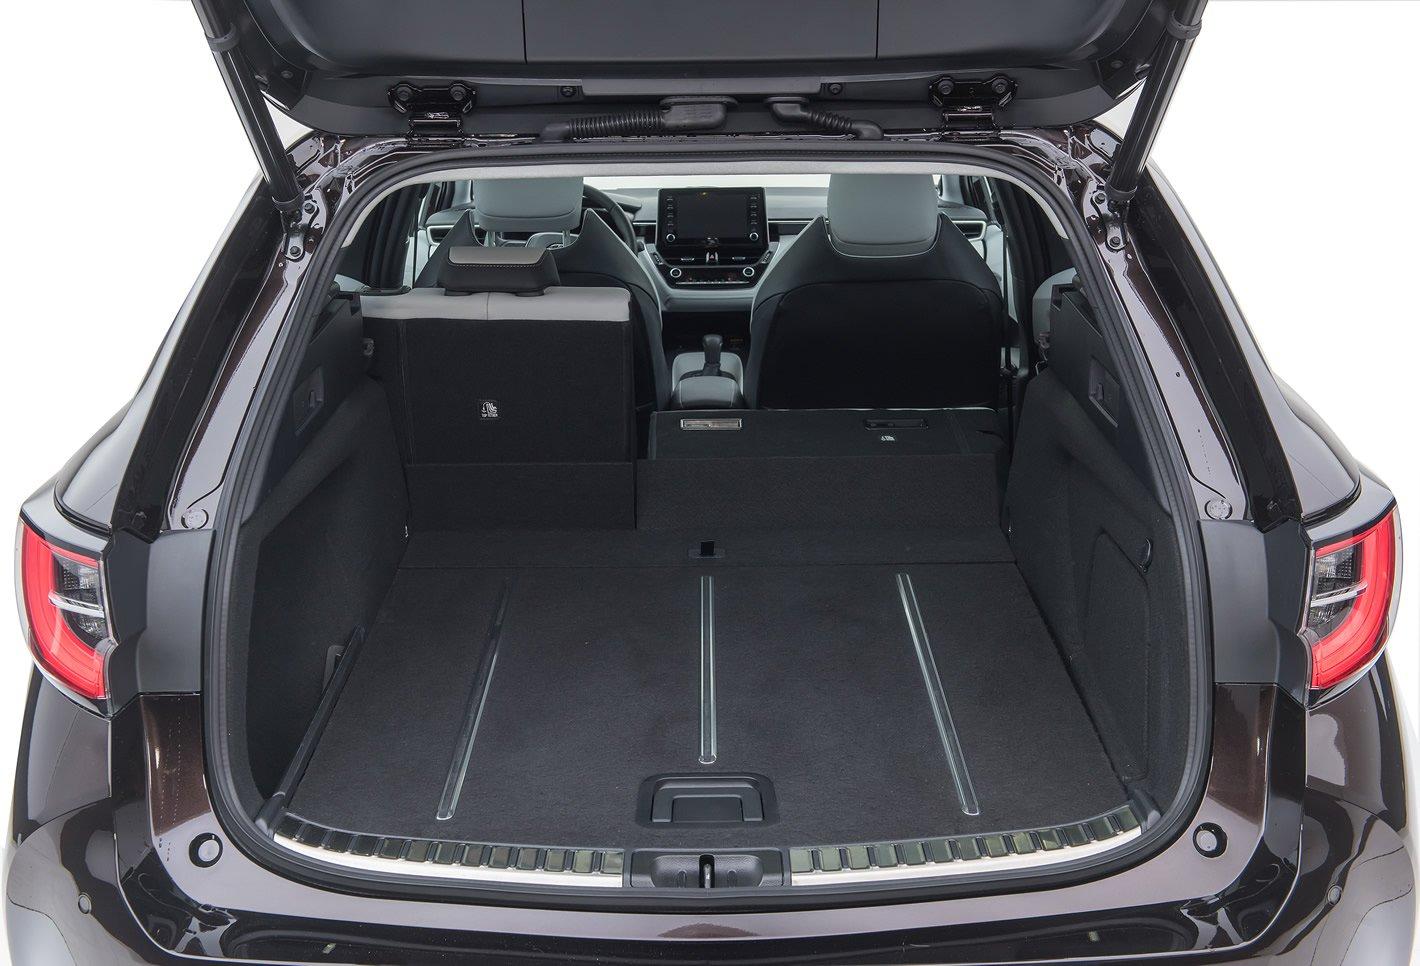 Toyota Corolla - bagażnik w Touring Sports